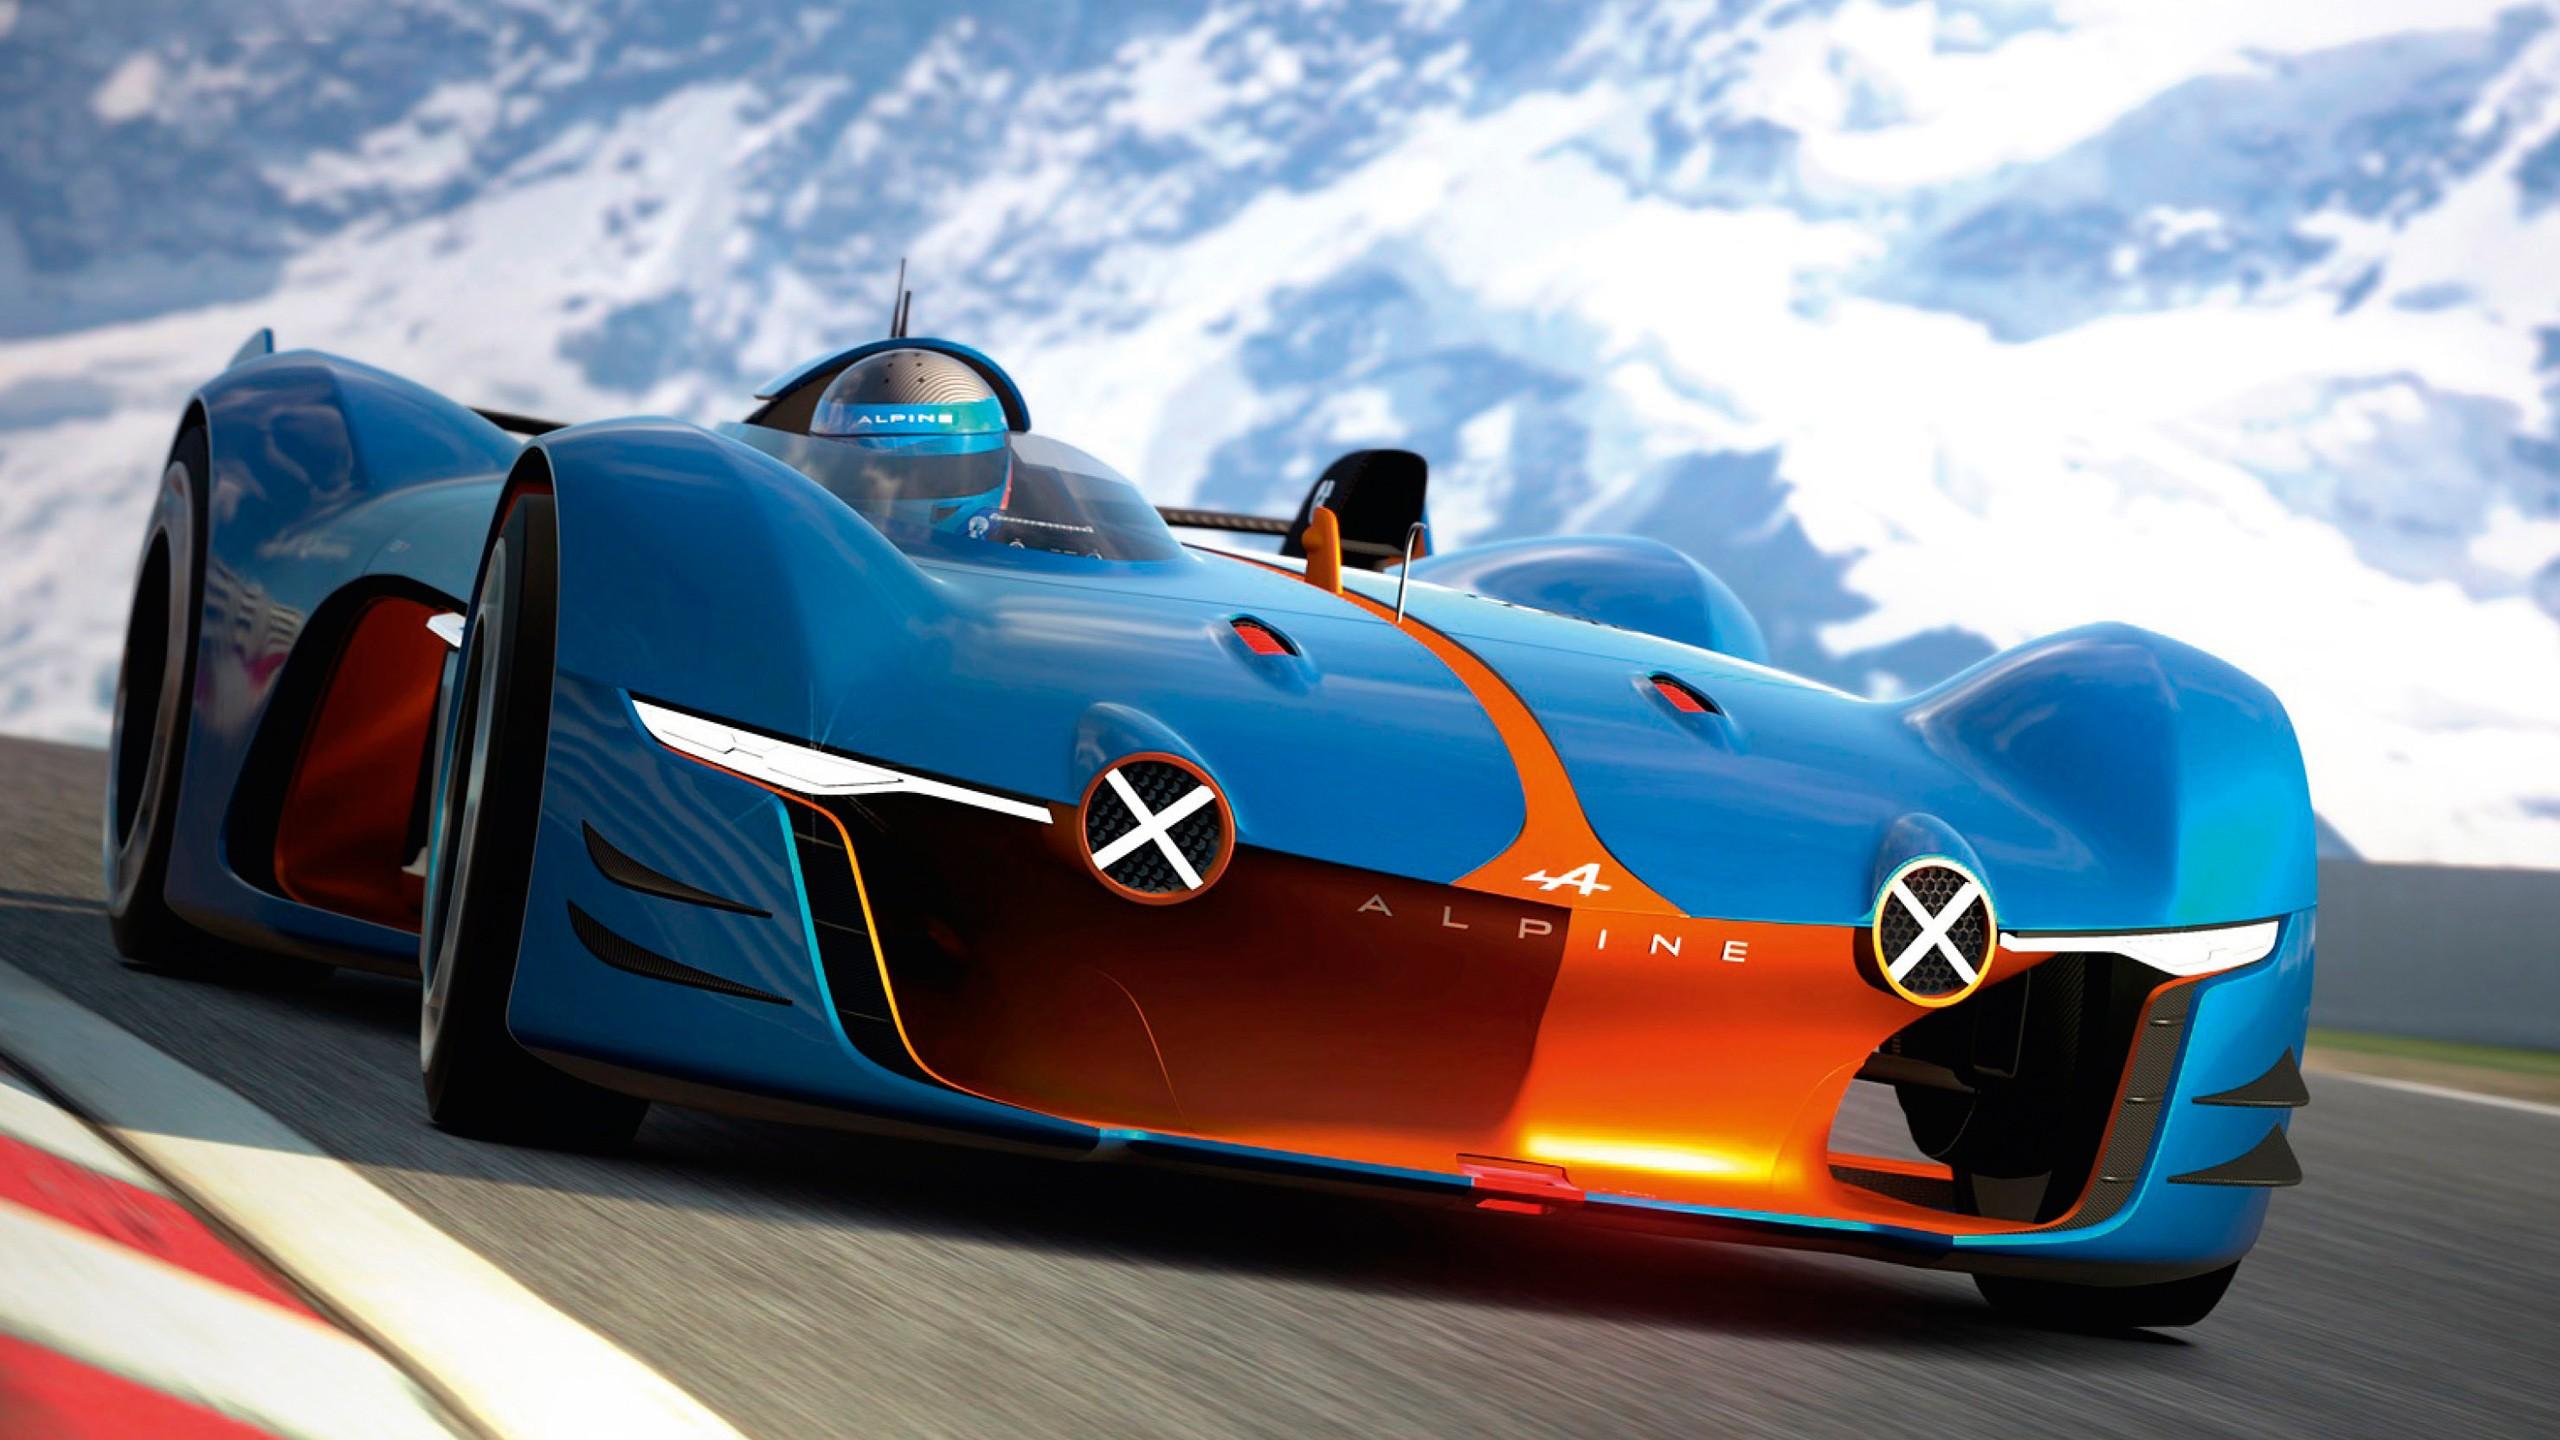 Gran Turismo Wallpaper Hd: 2015 Renault Alpine Vision Gran Turismo 3 Wallpaper